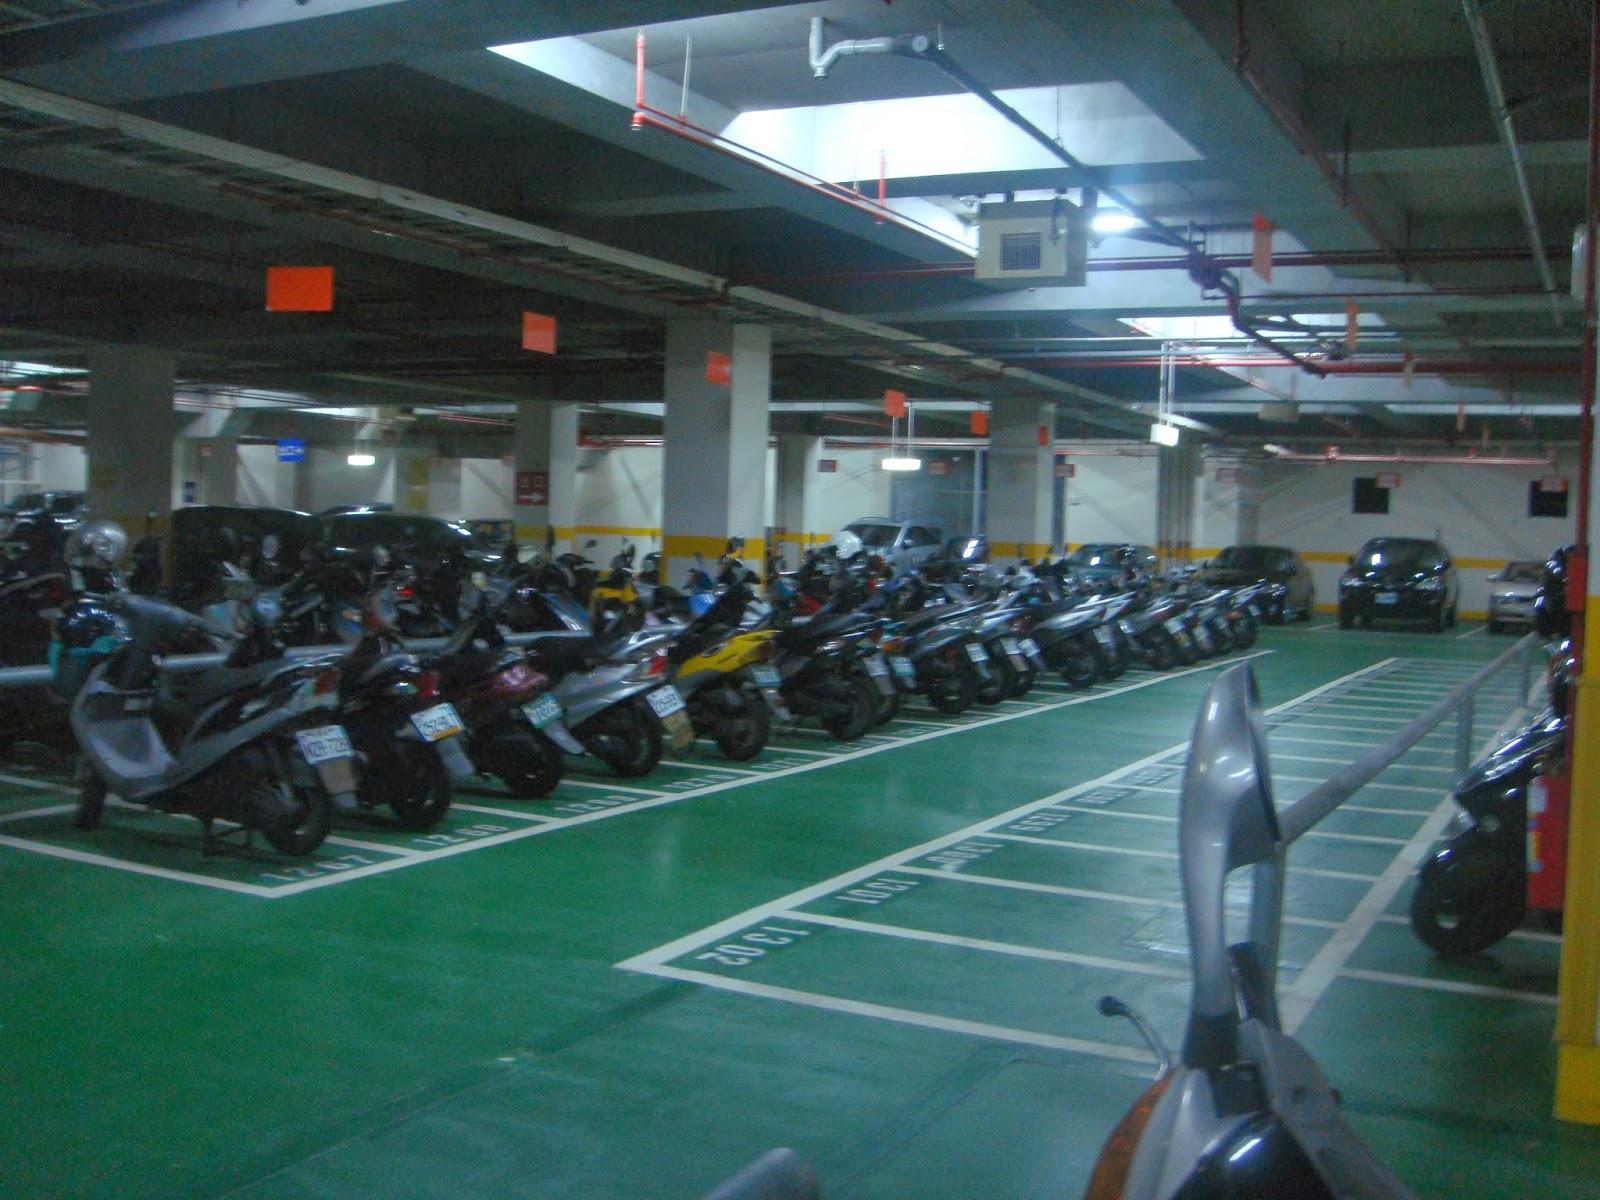 Тайпей, Тайвань, Азия, Asia, Taipei, Taiwan, паркинг мото, motorbike parking